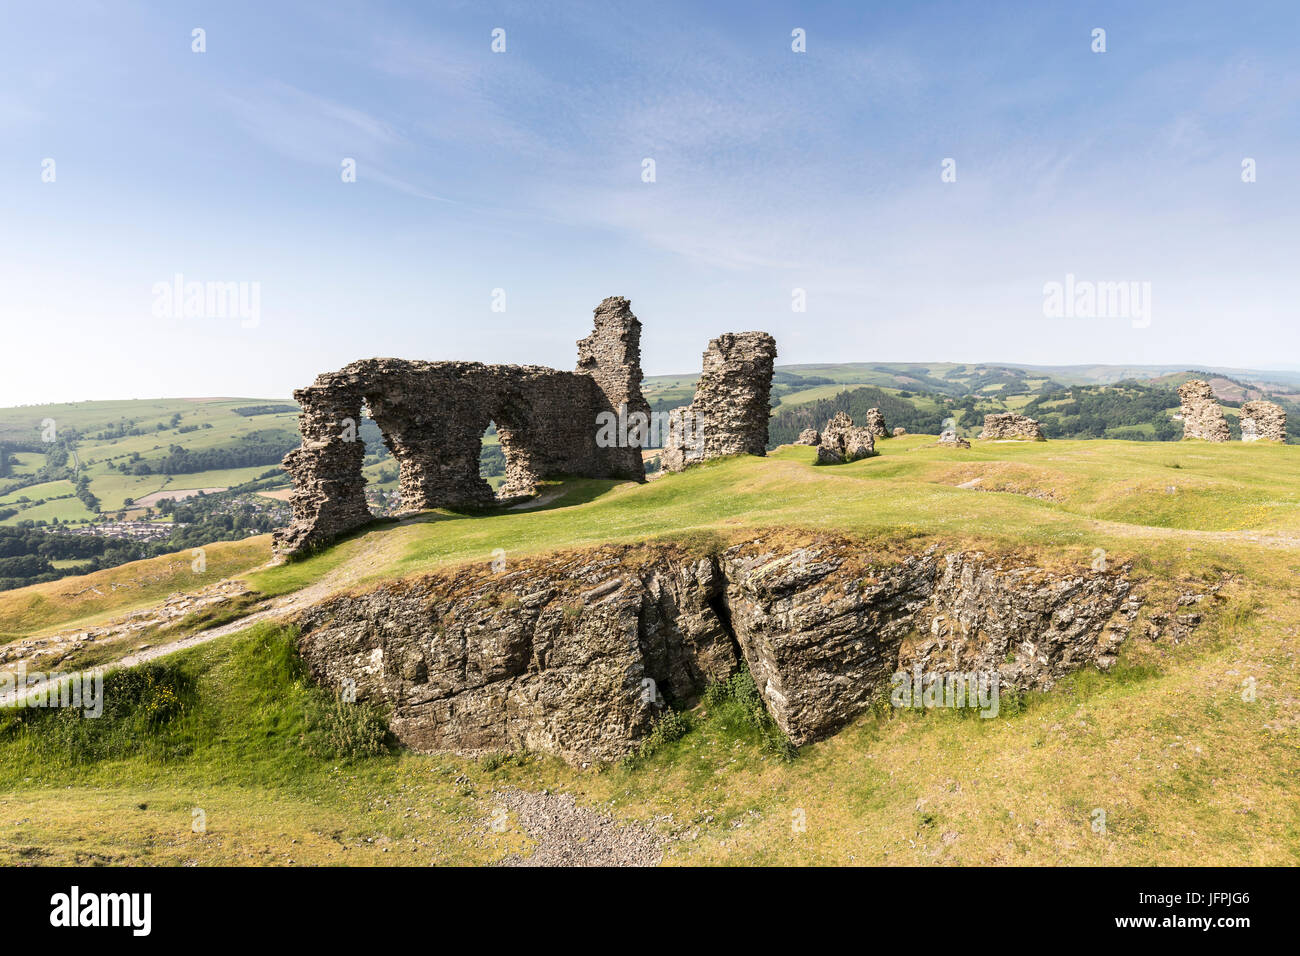 Dinas Bran Castle, Llangollen, Denbighshire, Wales, UK Stock Photo